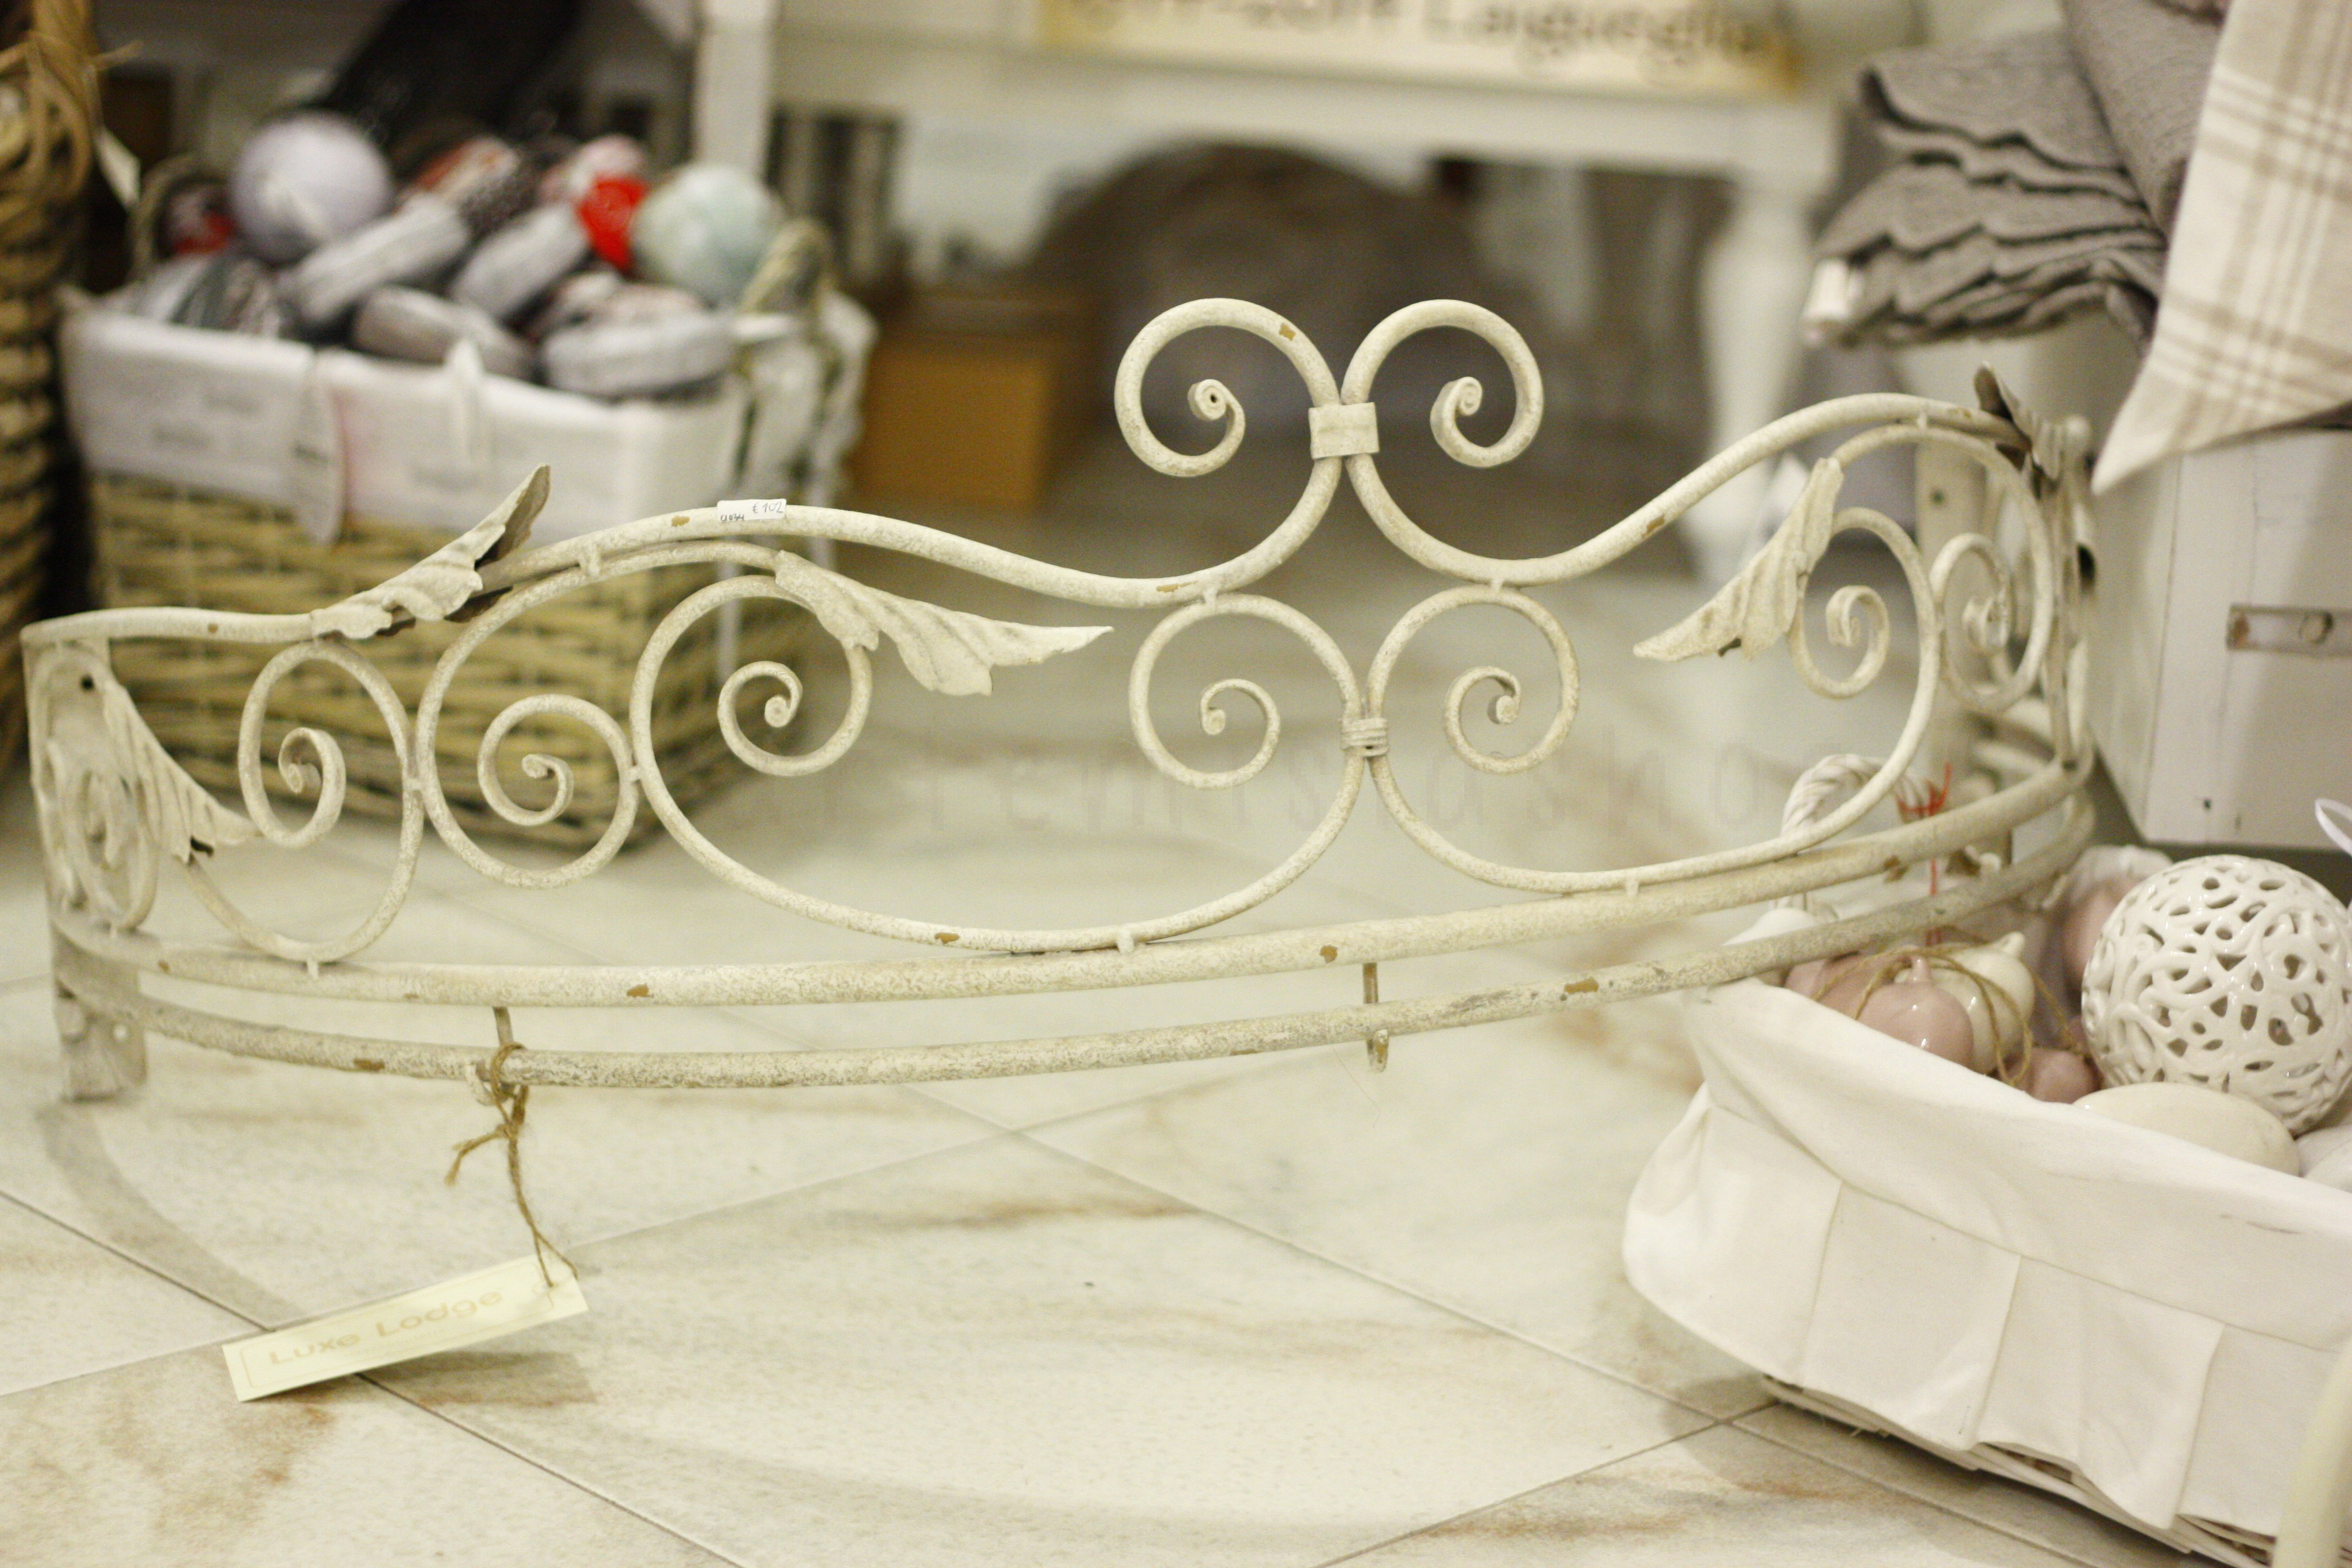 Ciel de lit vendita on line pannelli termoisolanti for Design vendita on line